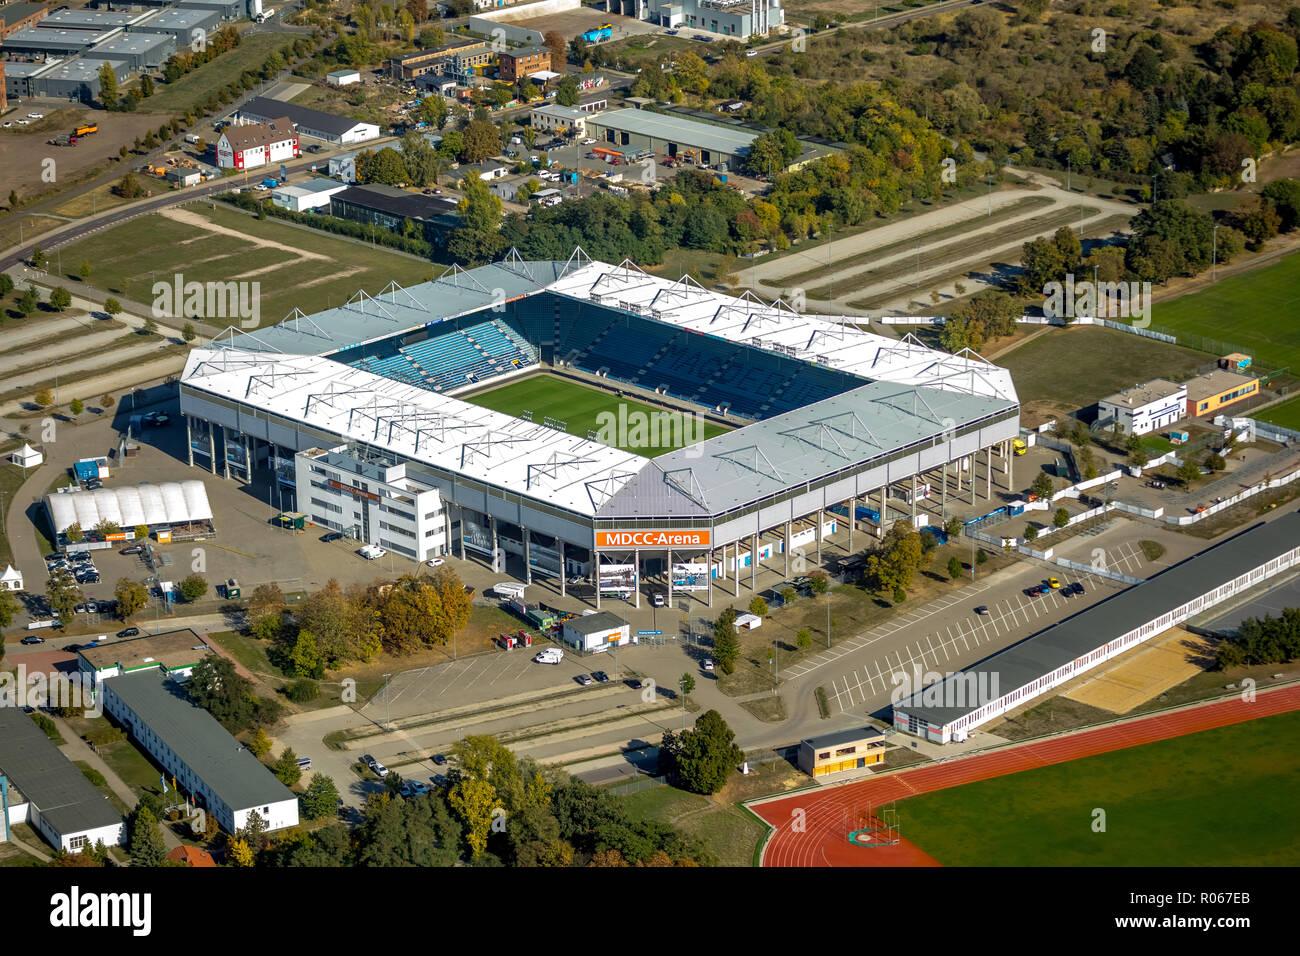 Aerial view, MDCC Arena, football stadium, 1. FC Magdeburg e. V., Brückfeld, Magdeburg, Saxony-Anhalt, Germany, DEU, Europe, aerial view, birds-eyes v - Stock Image